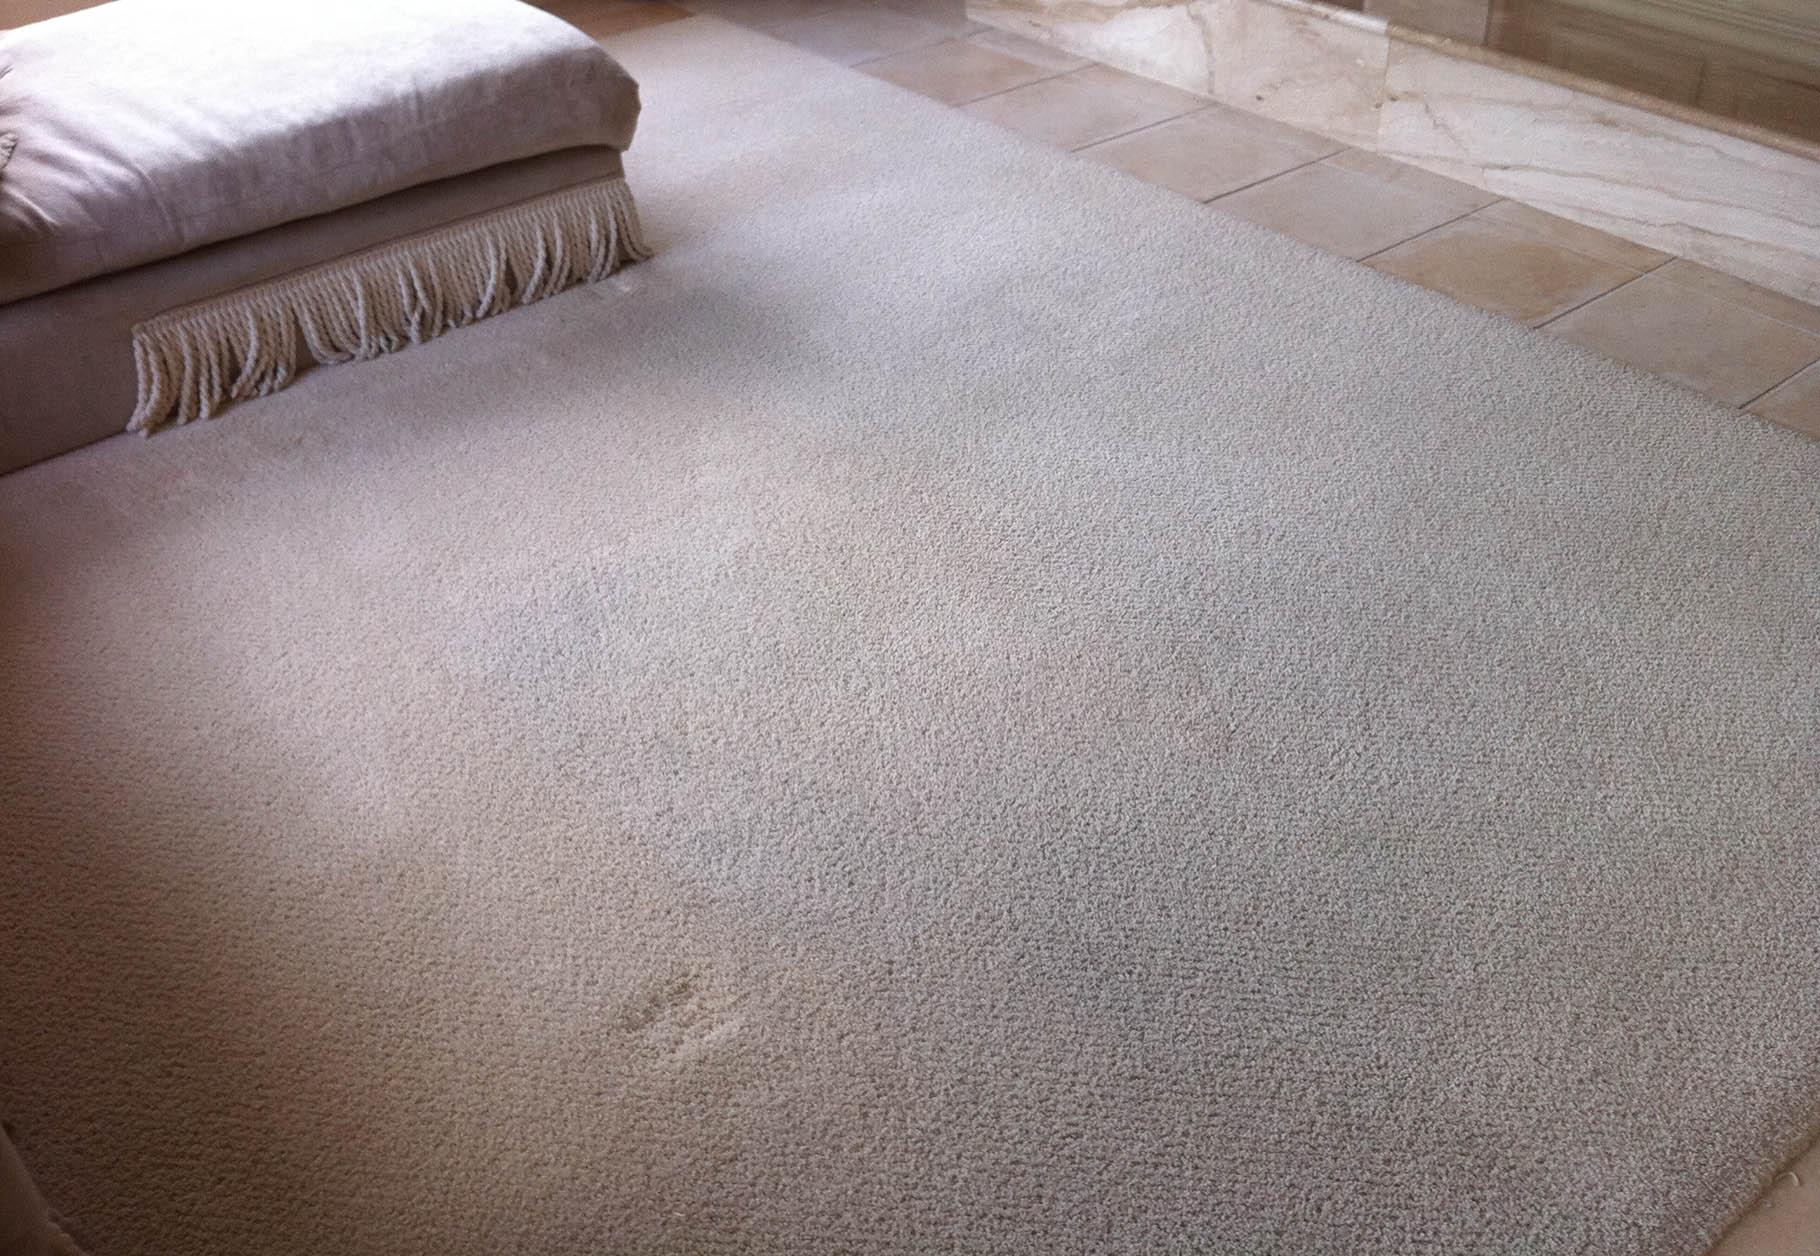 Carpet After Heaven's Best Carpet Cleaning